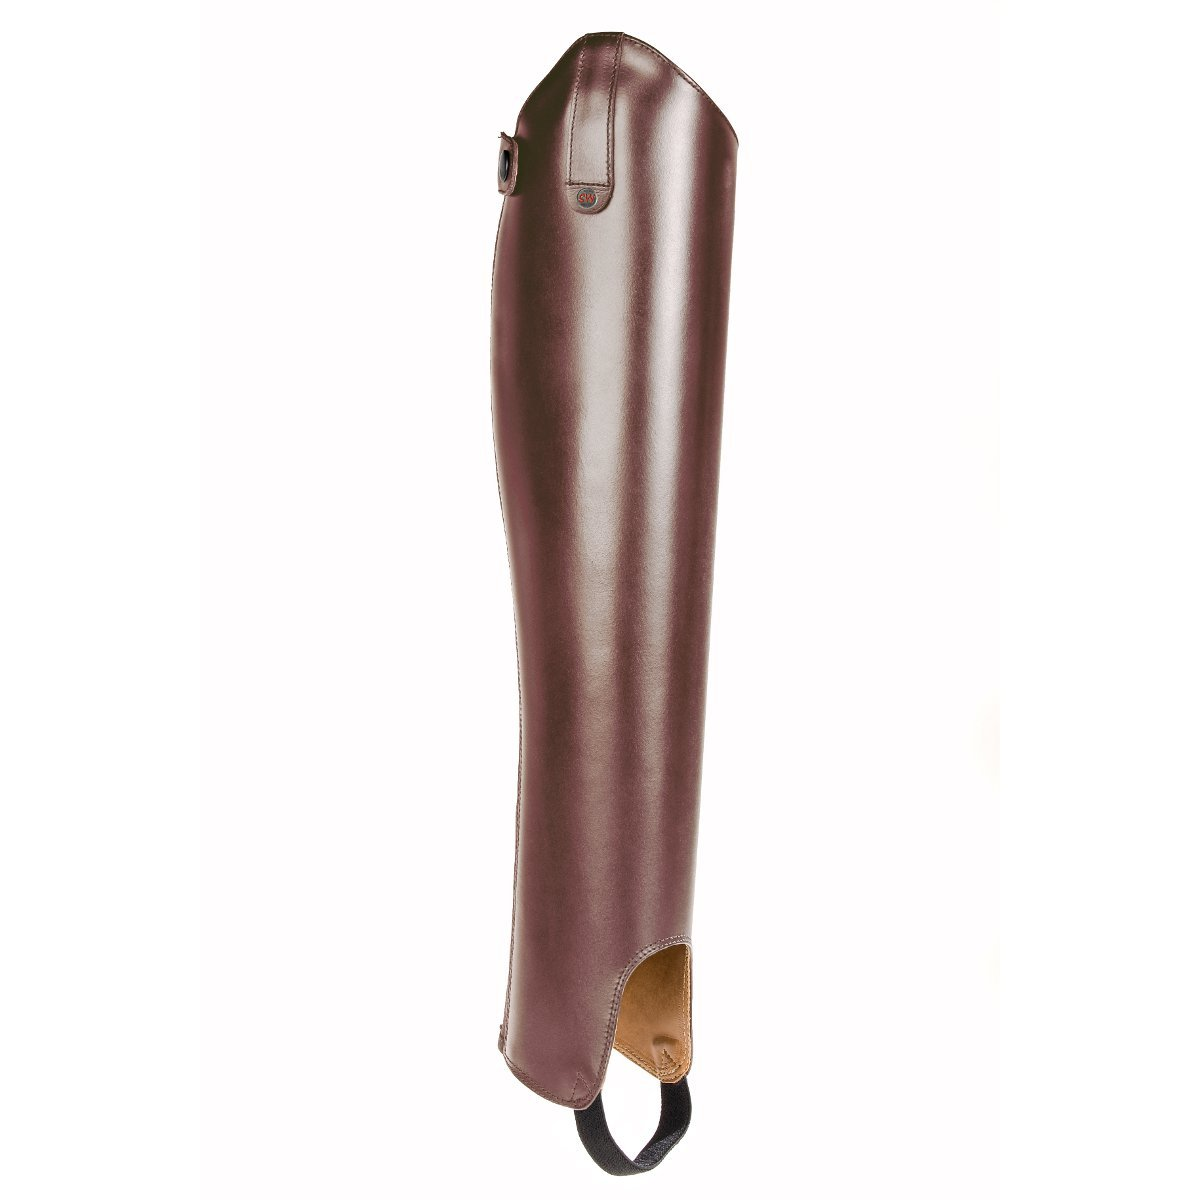 SUEDWIND - HALF CHAP Comfort Fit - braun - MM - 38 50